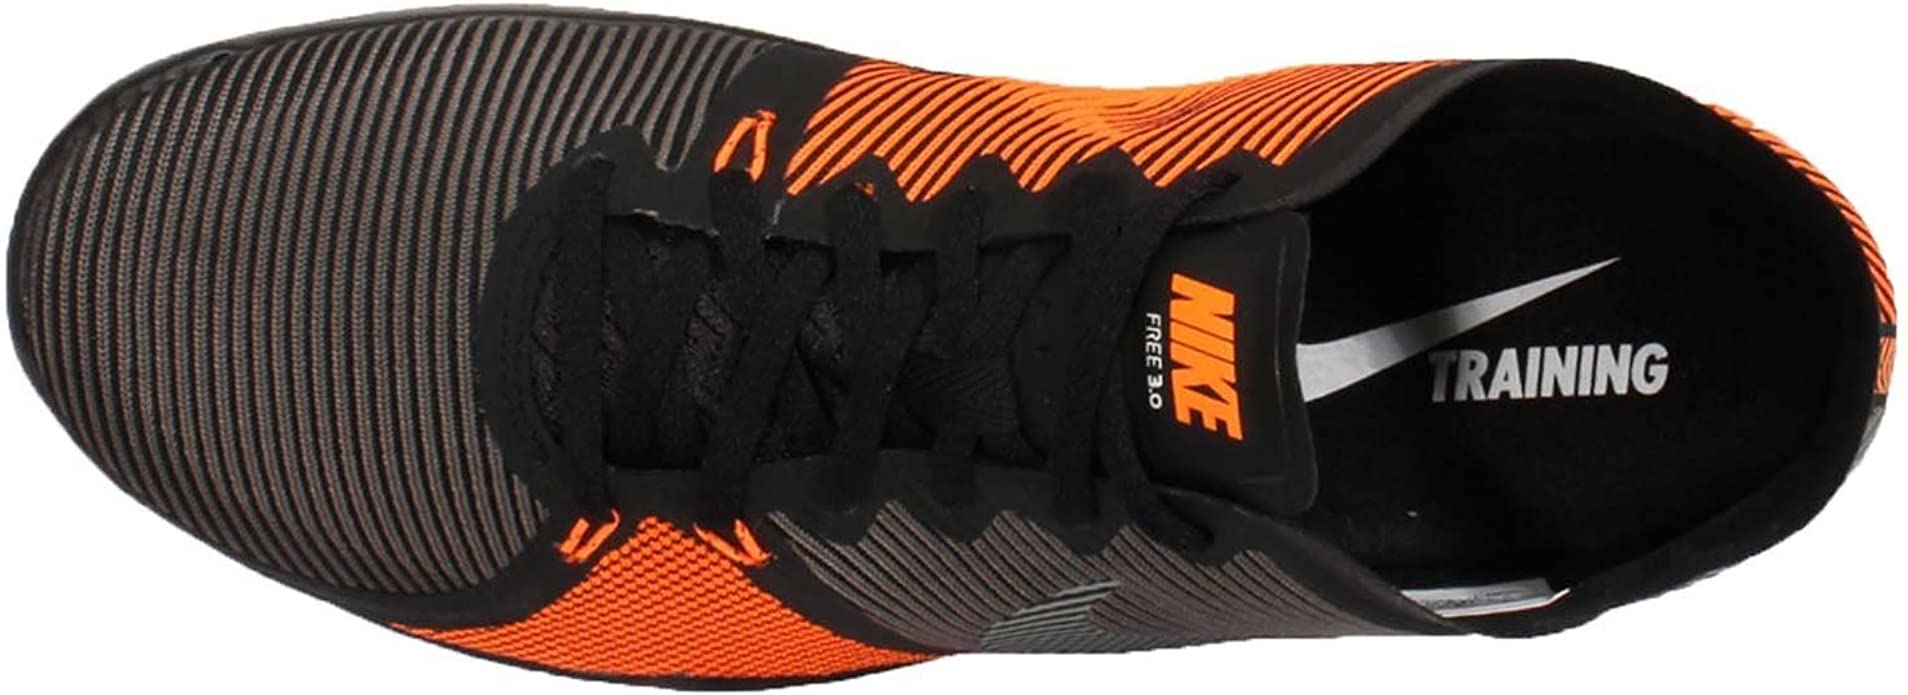 Amazon.com | Nike Free Trainer 3.0 V4 Mens | Fitness & Cross-Training